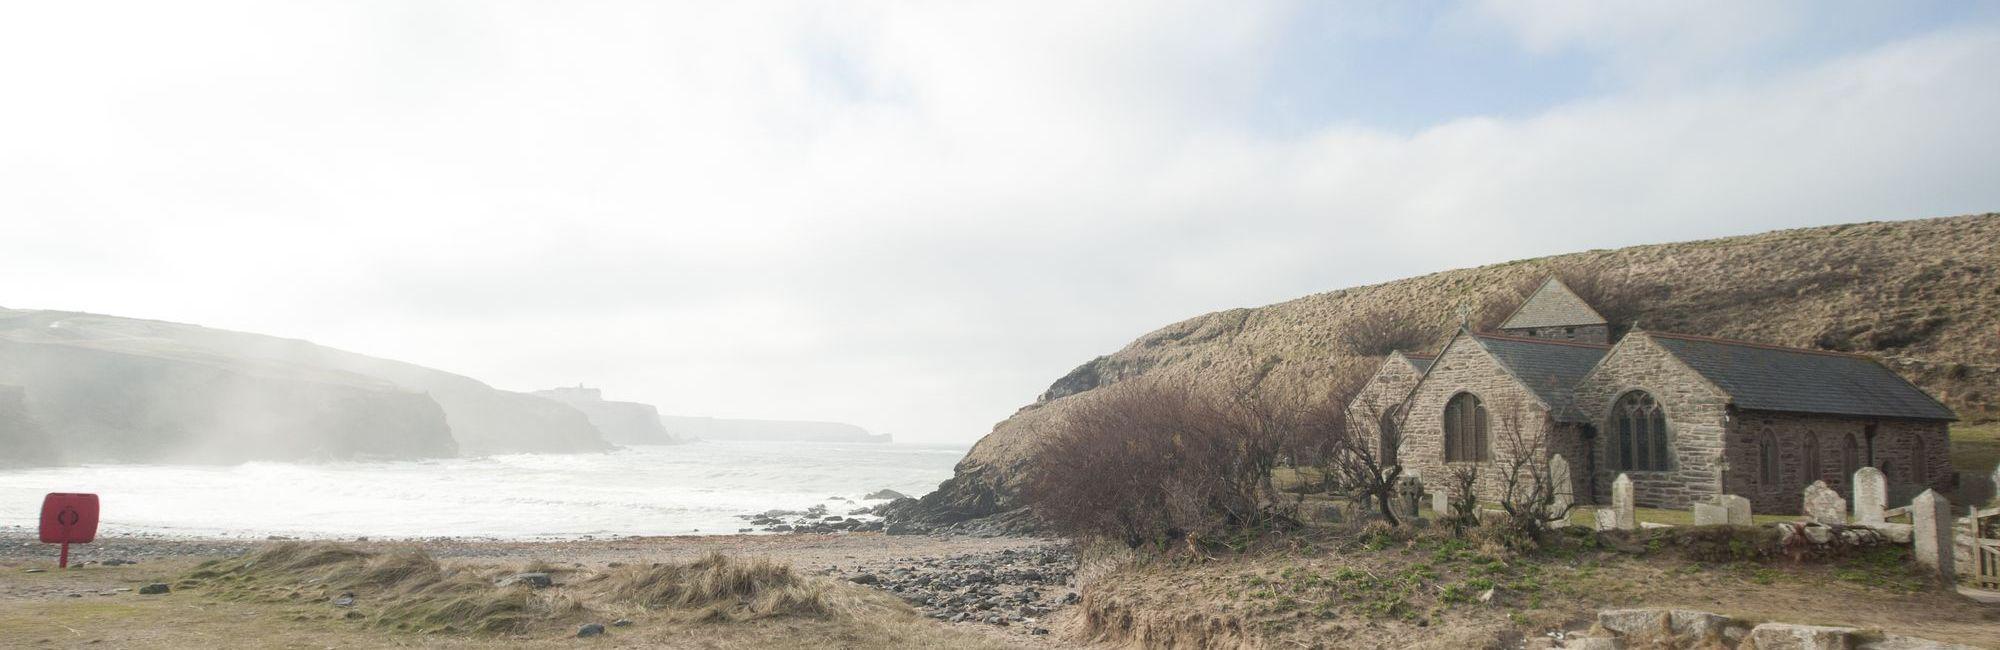 Church Cove, Gunwalloe - Adam Gibbard